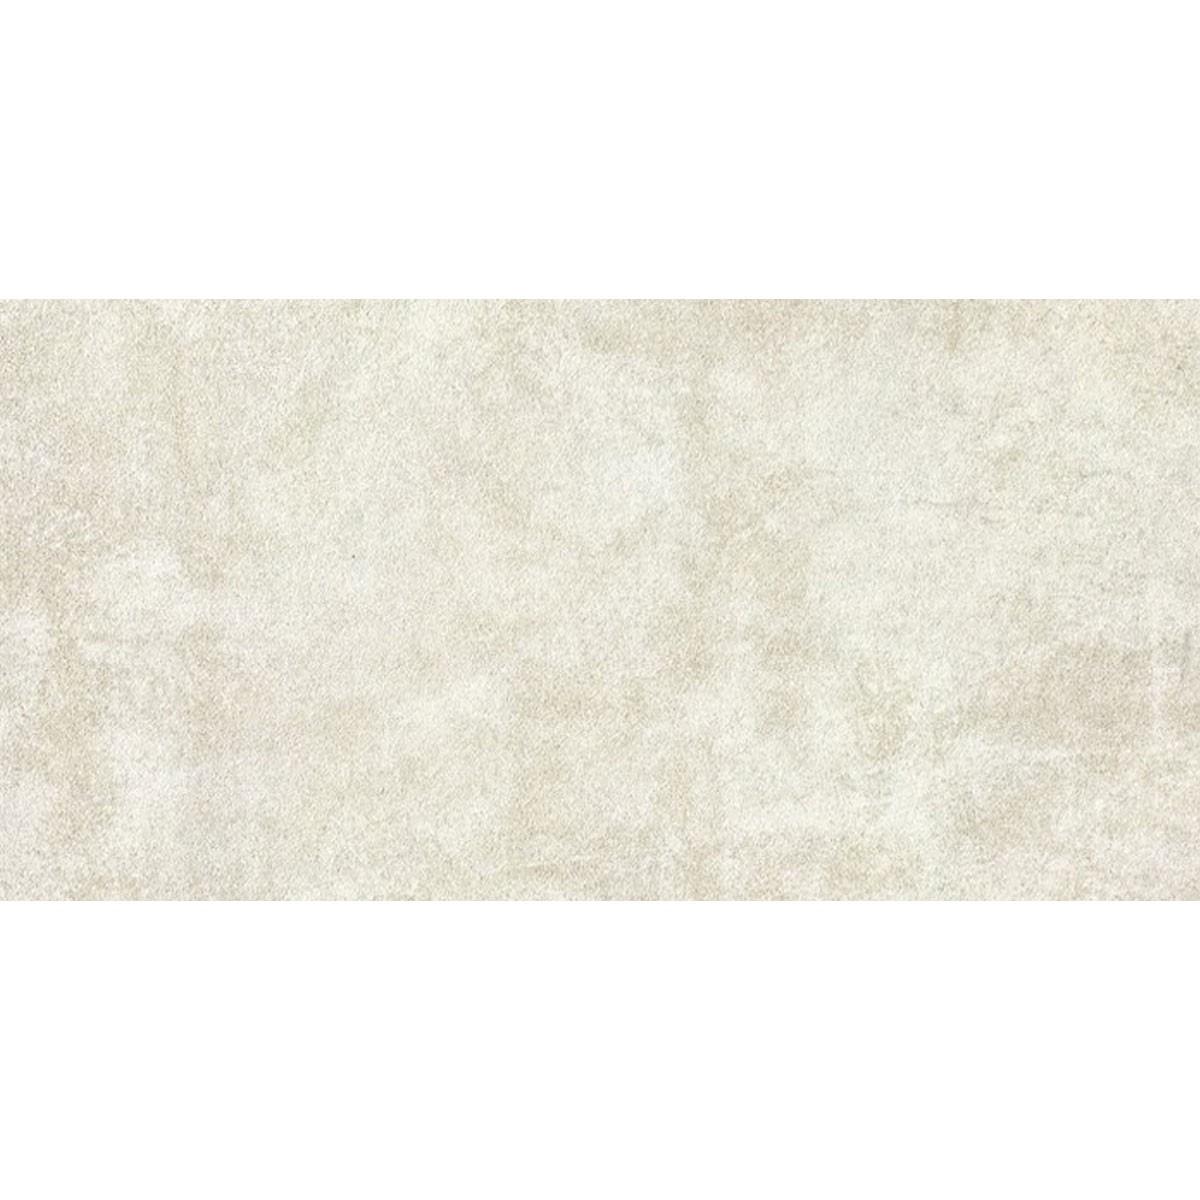 24 x 12 In. Beige Porcelain Floor Tile - 8 Pcs/Case (15.50 sq.ft/Case) (GN60A-2)